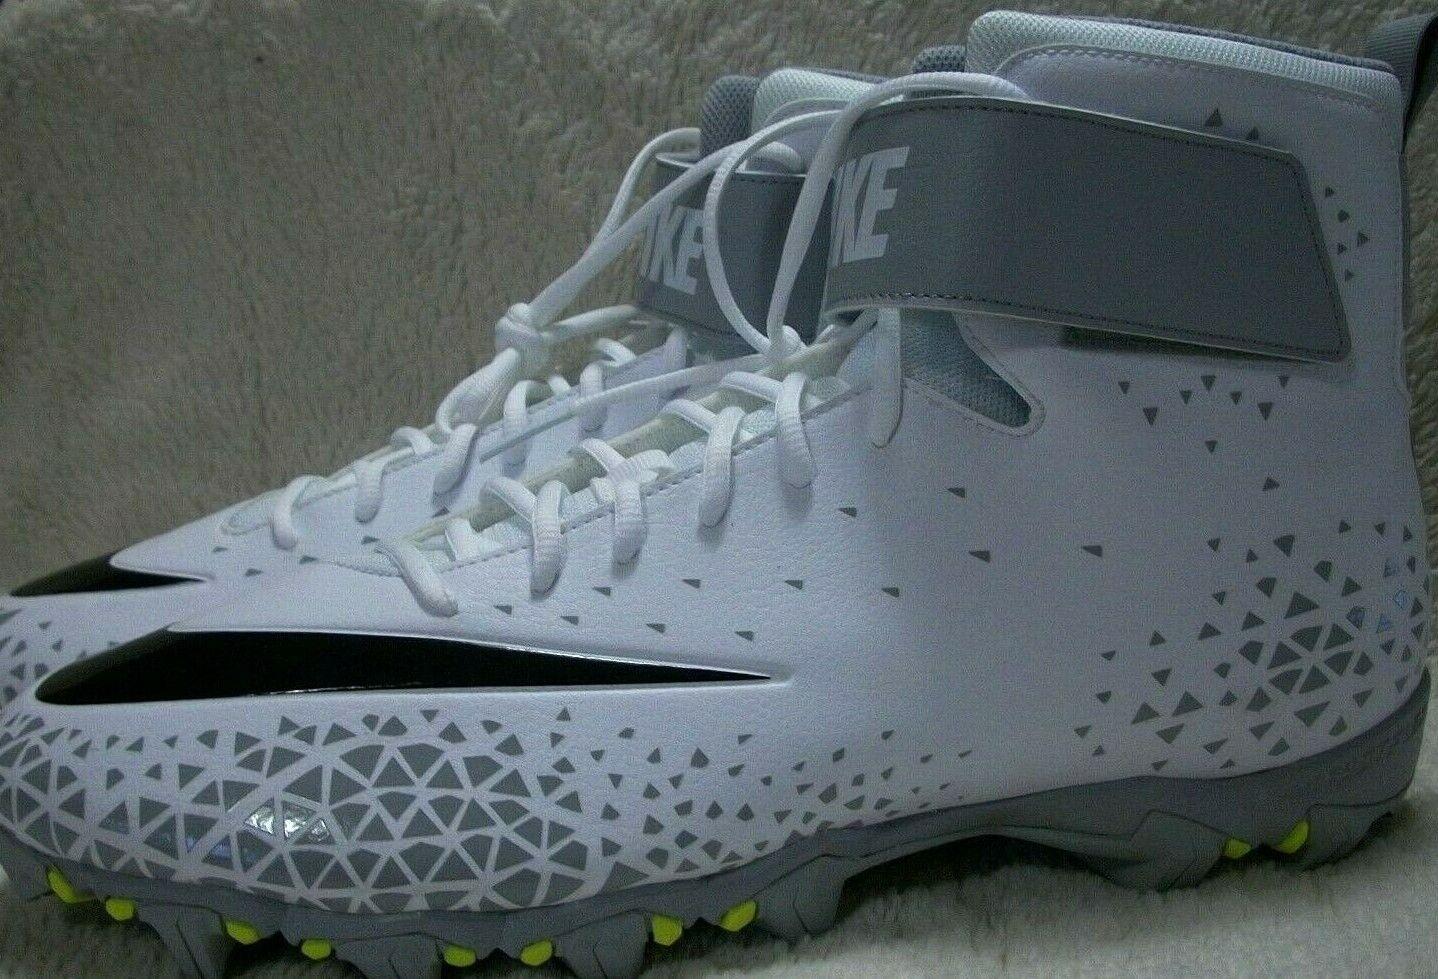 Nike Force Savage Shark 880109 105 Men's Size 16